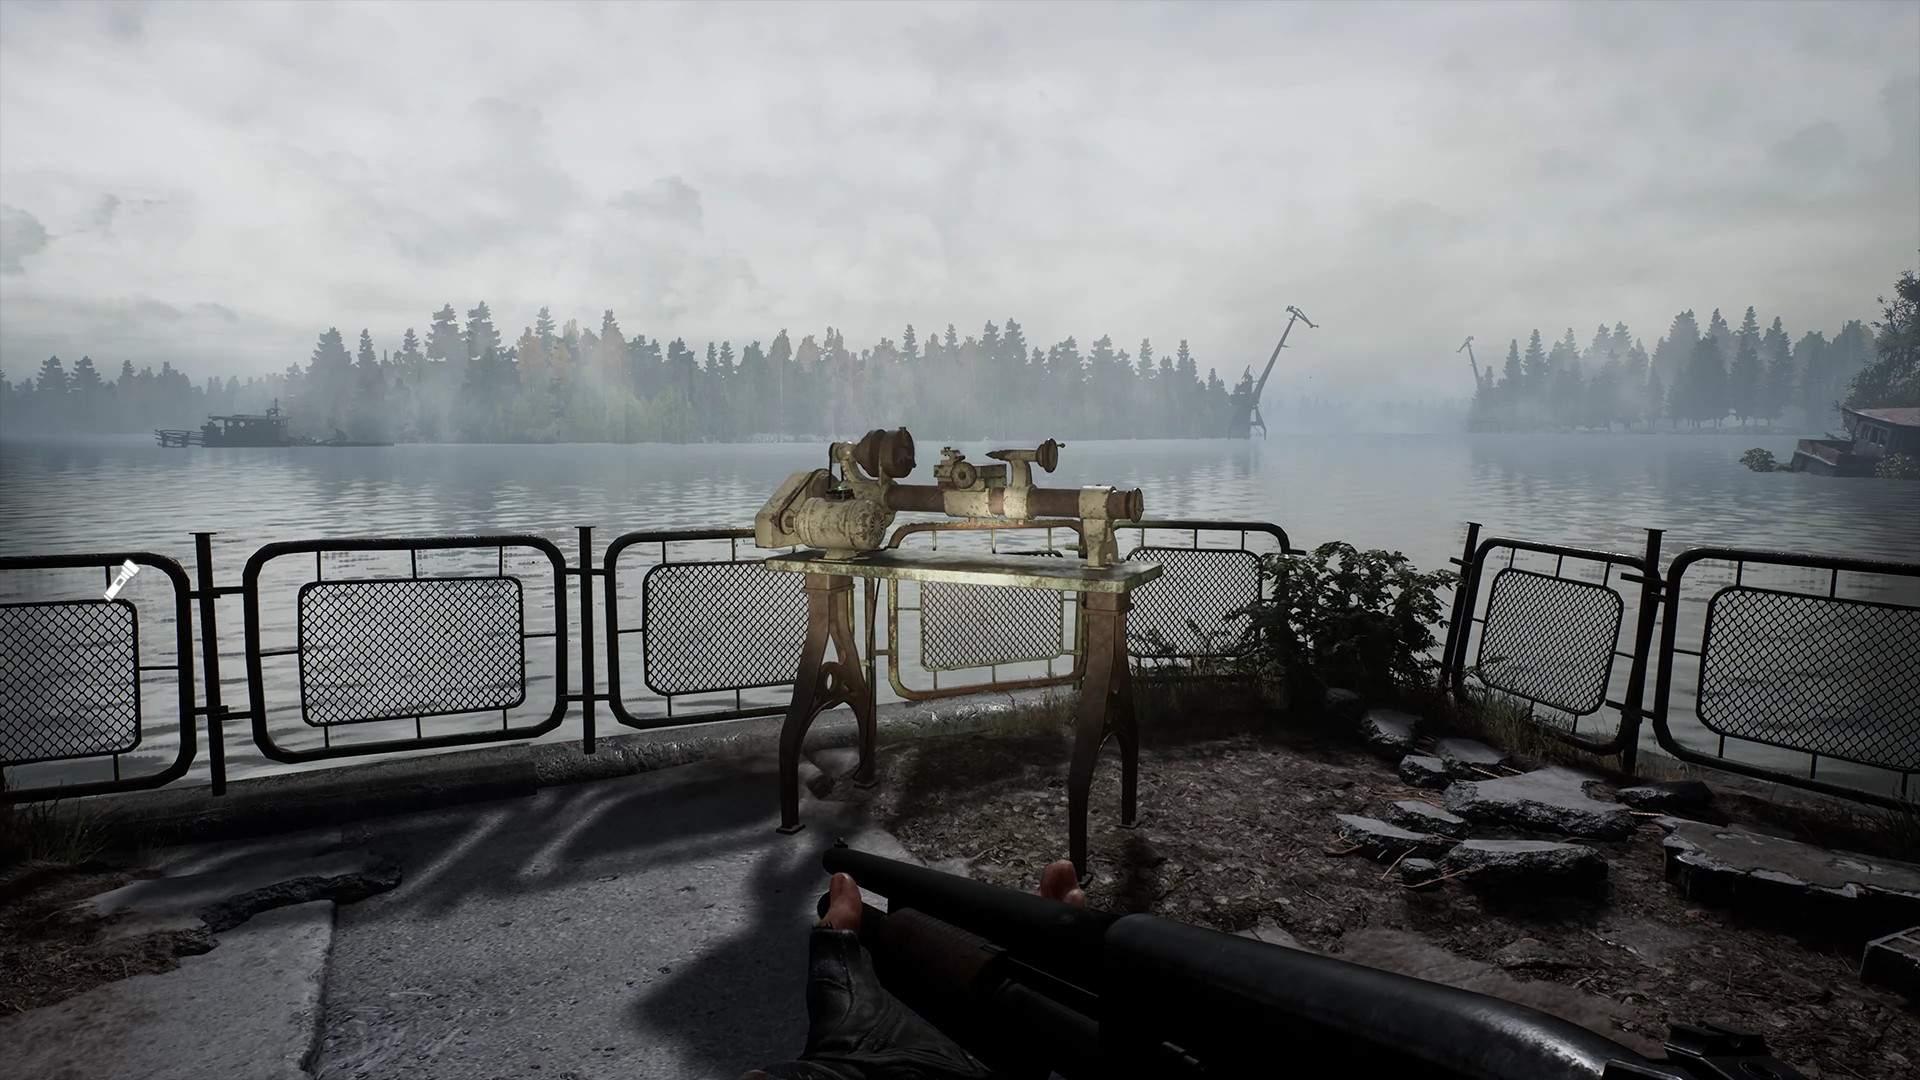 Chernobylite Image